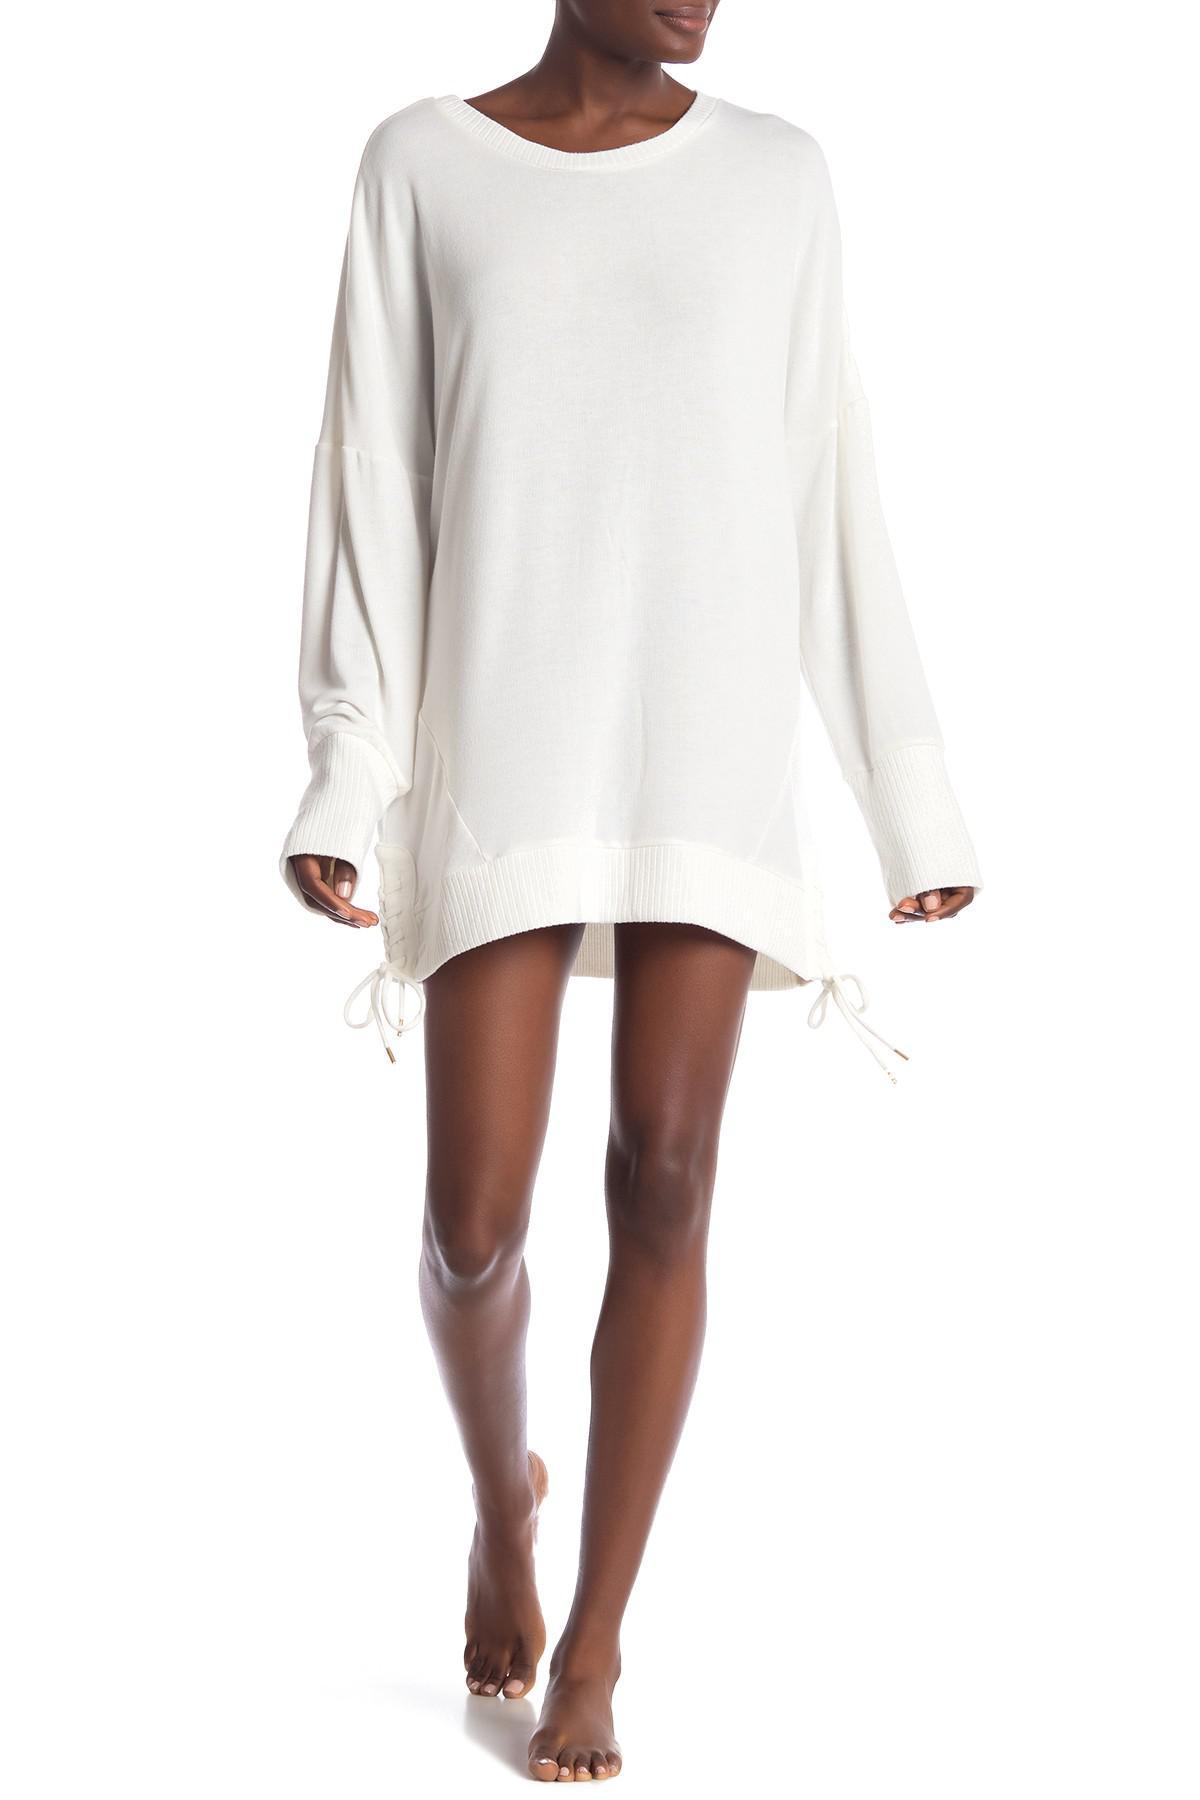 2b82880b3cf2 Lyst - Honeydew Intimates Sleep Queen Knit Sleep Dress in White